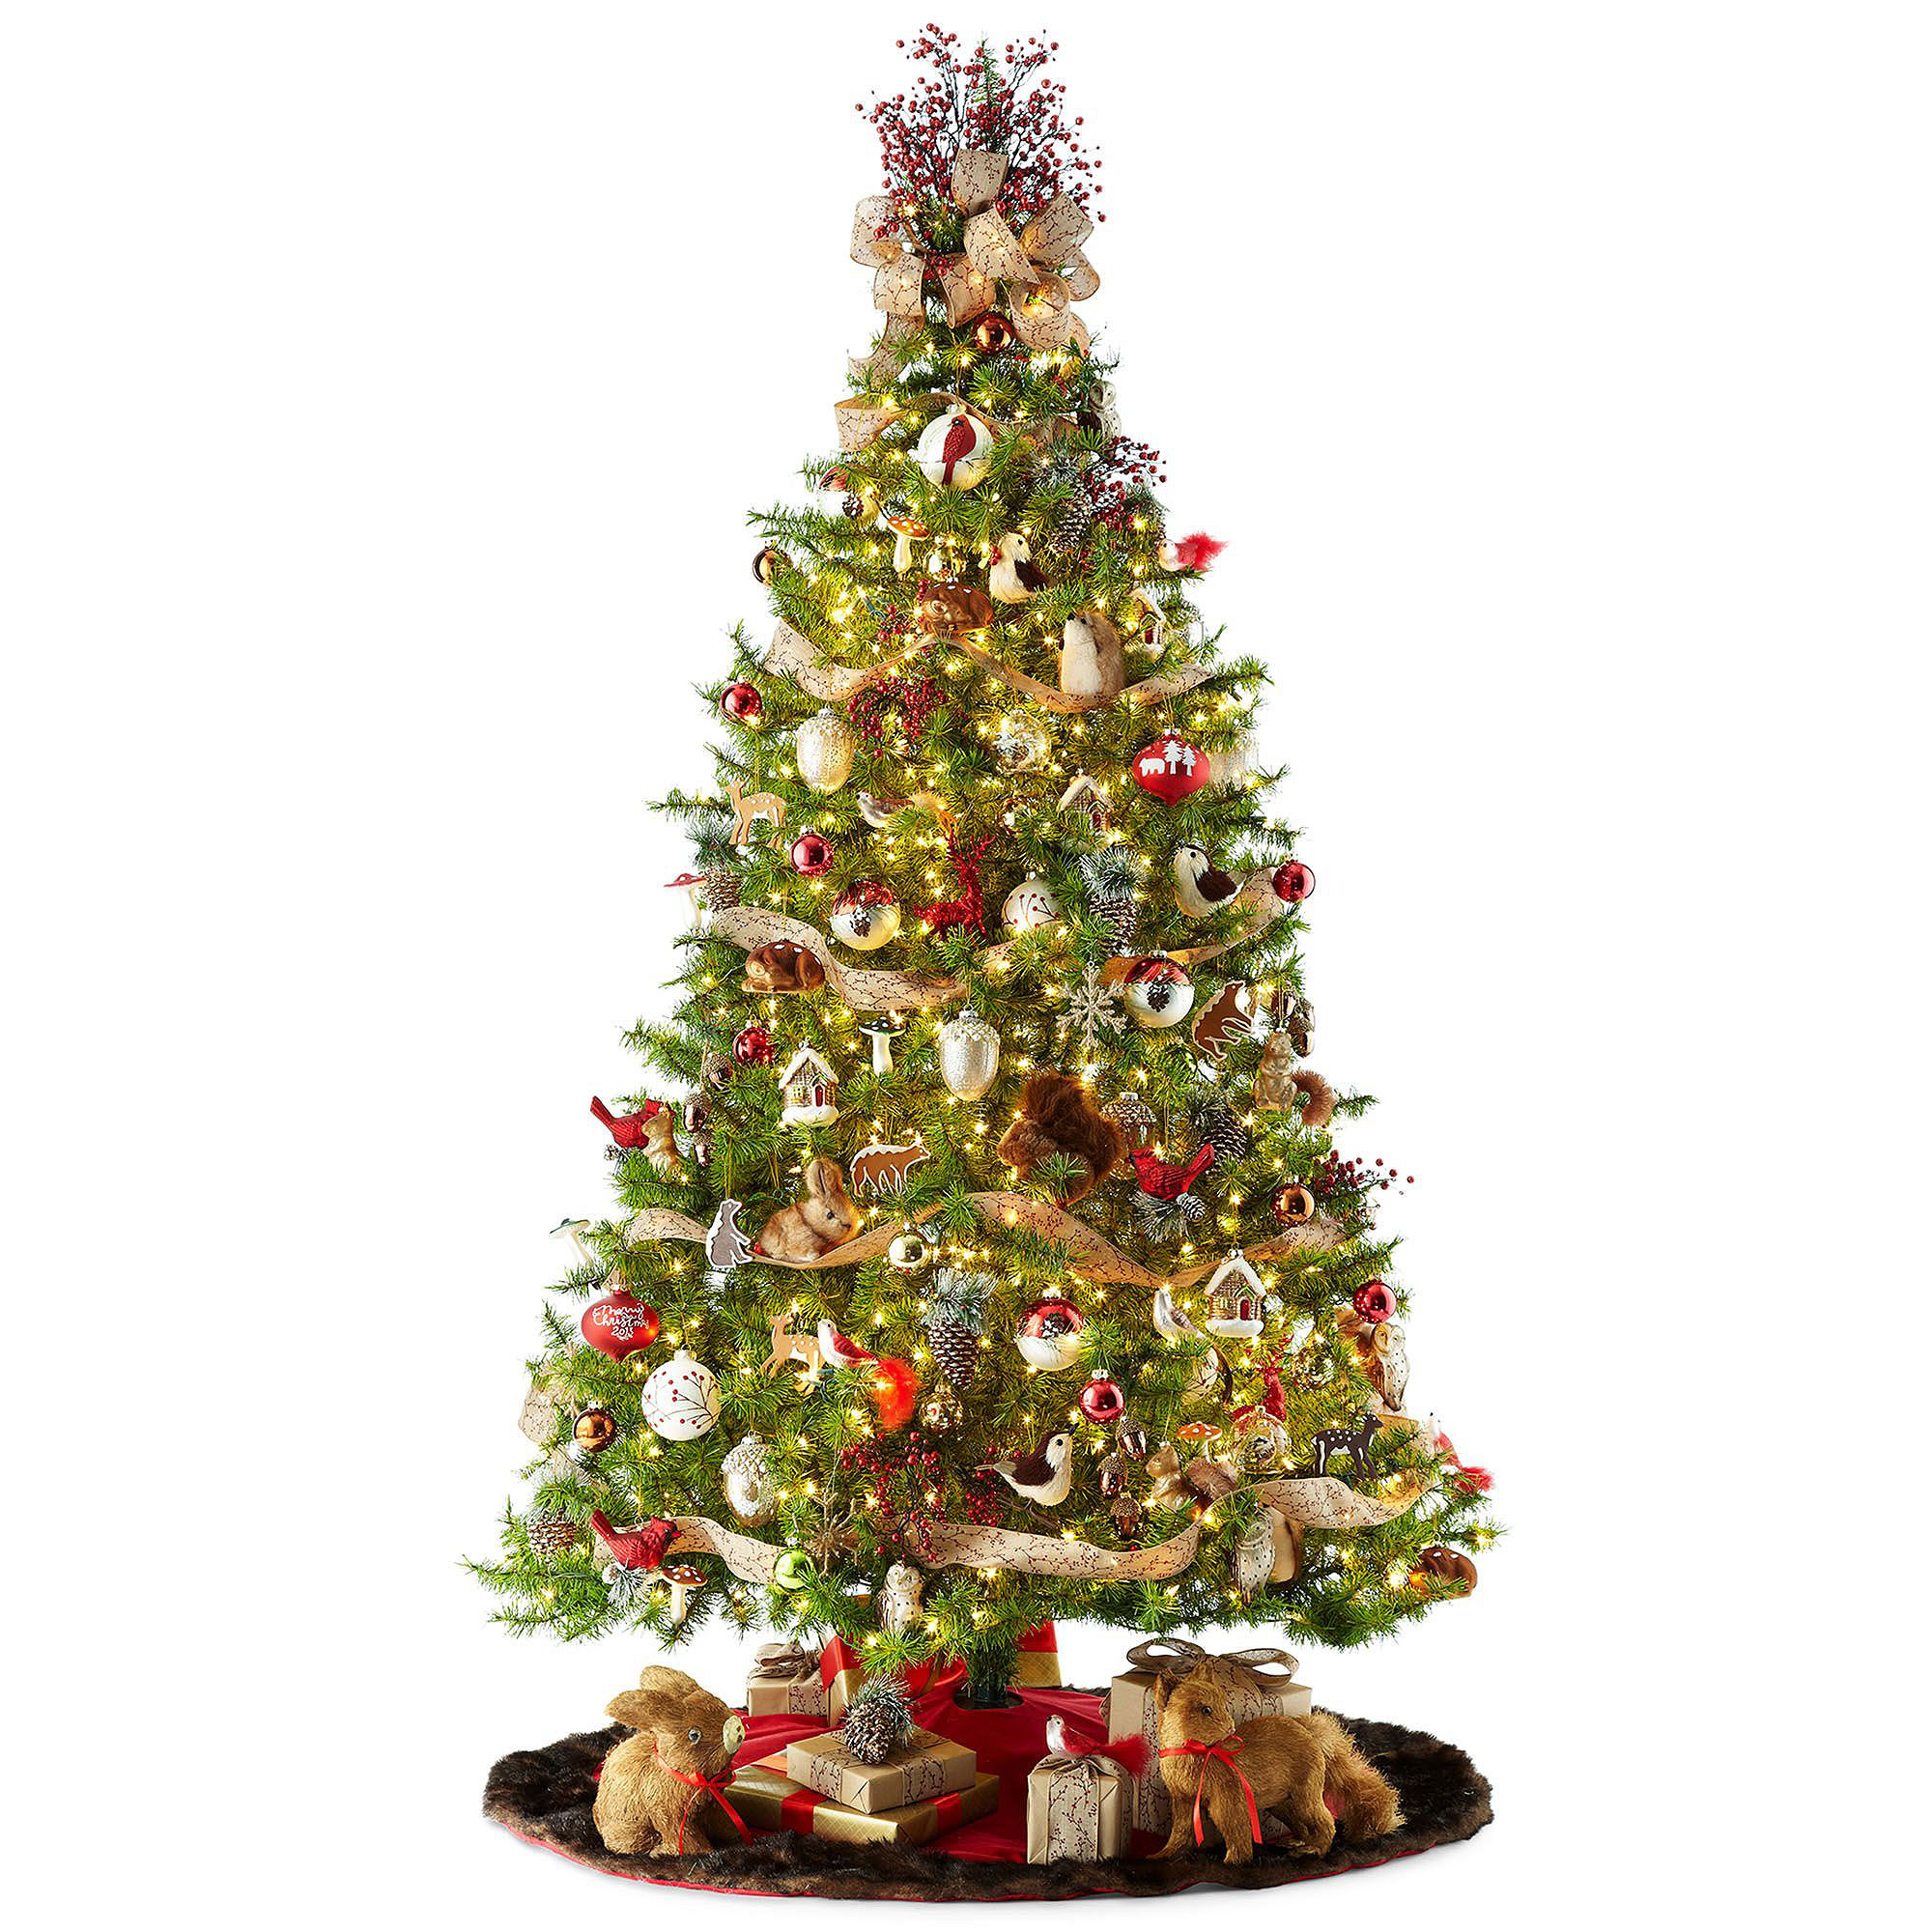 9 Foot Christmas Tree - Buy 9 Ft Artificial Christmas ...